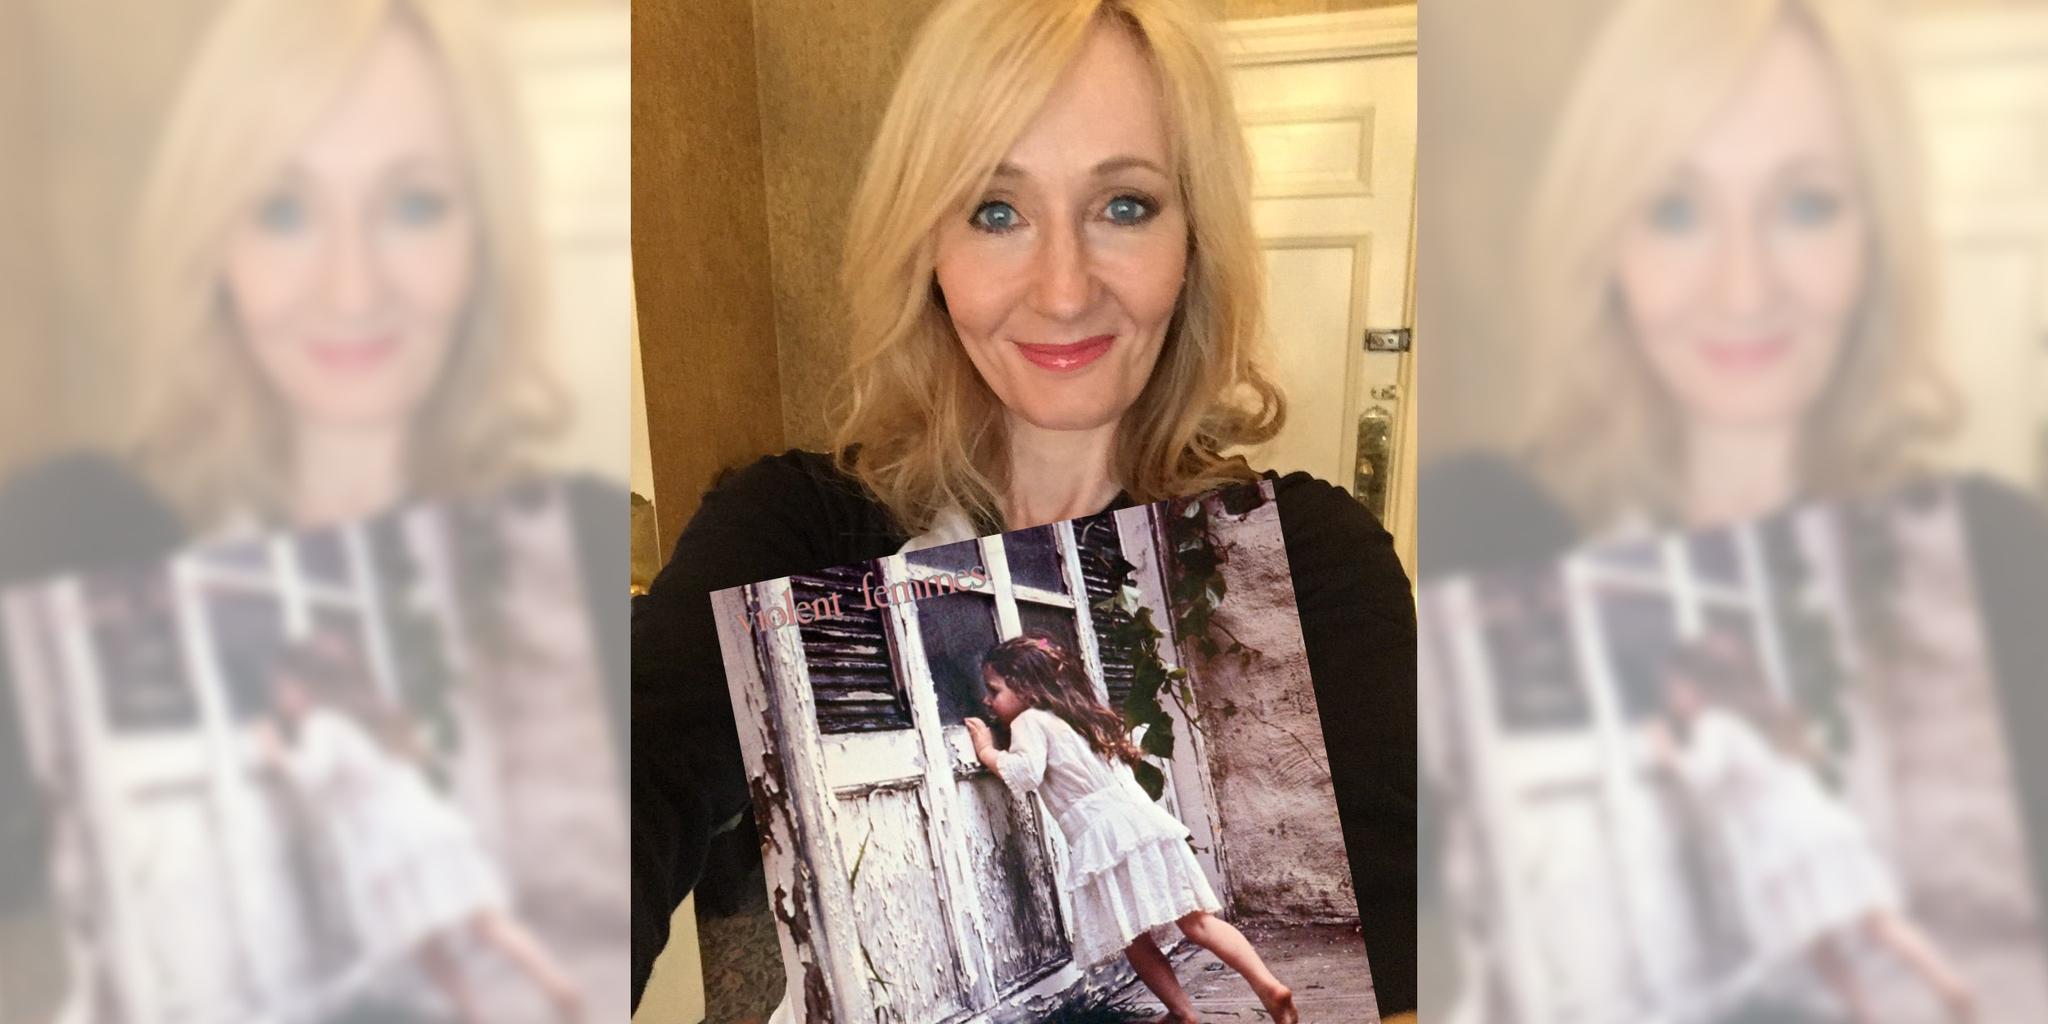 JK Rowling reviews the Violent Femmes